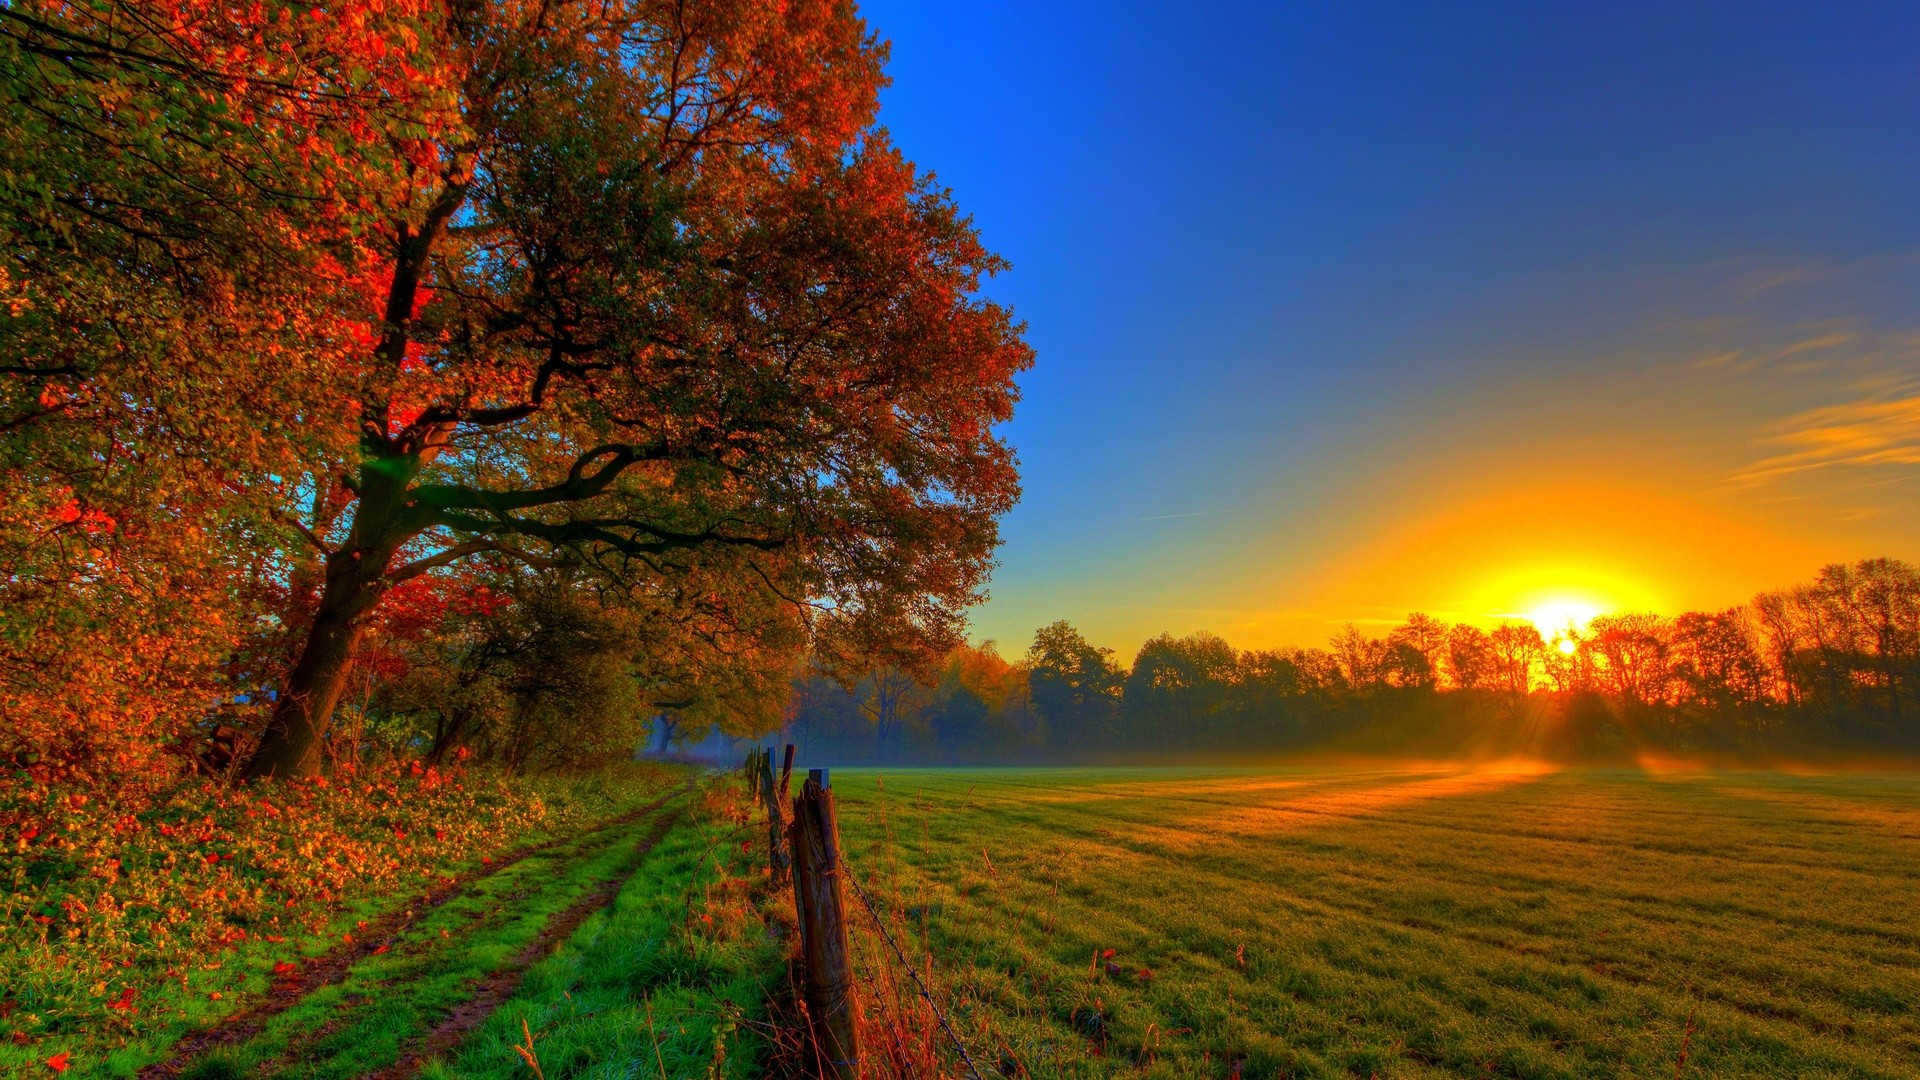 fall landscape field trees sunlight sunset nature